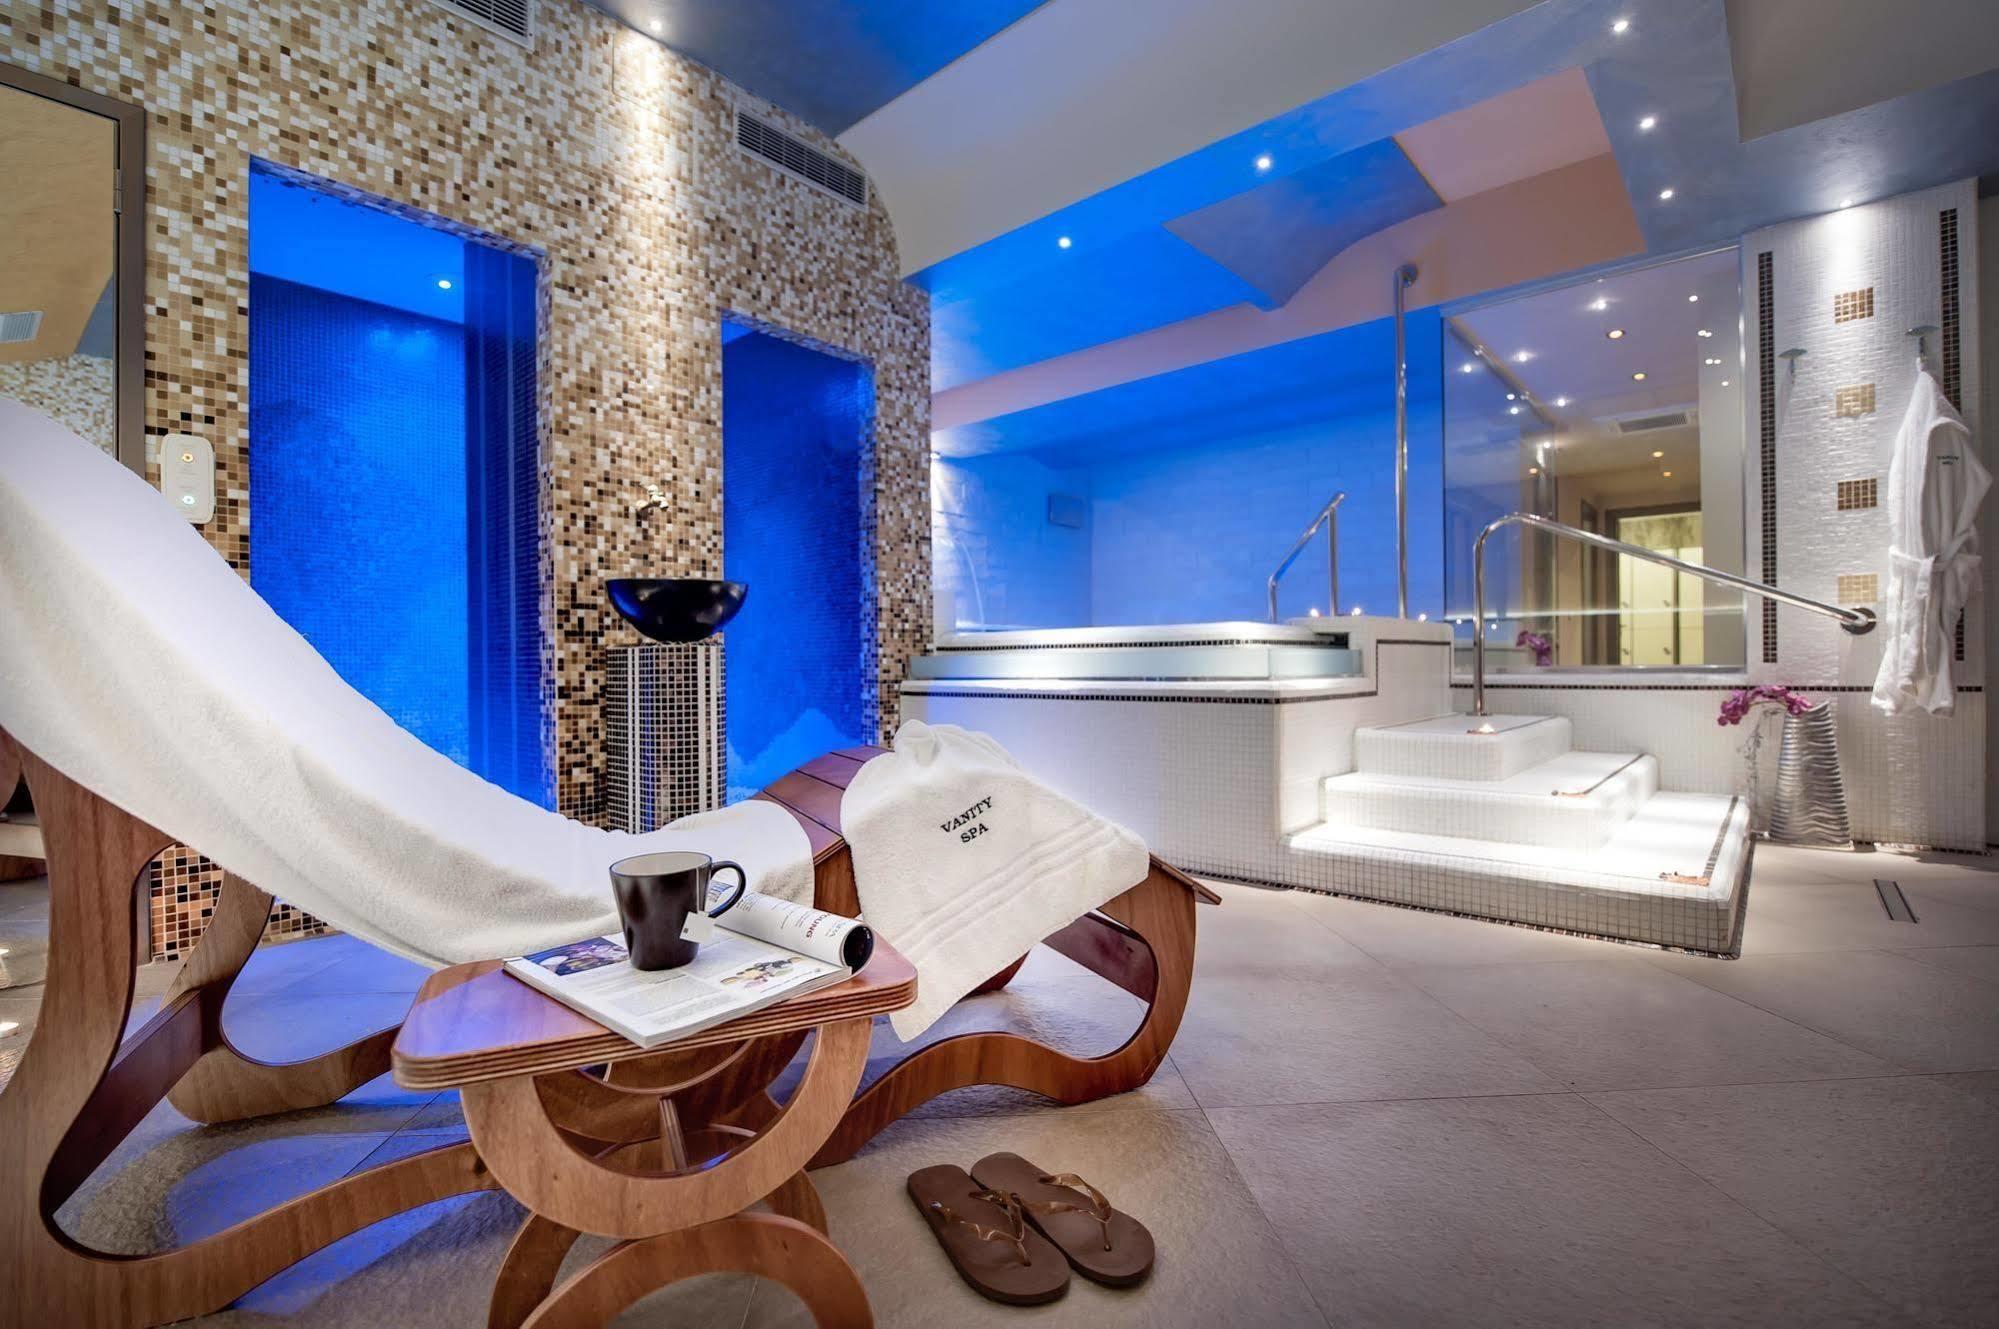 Lavabo Olimpo Roca.Aparthotel Vanity Spa A Balestrate